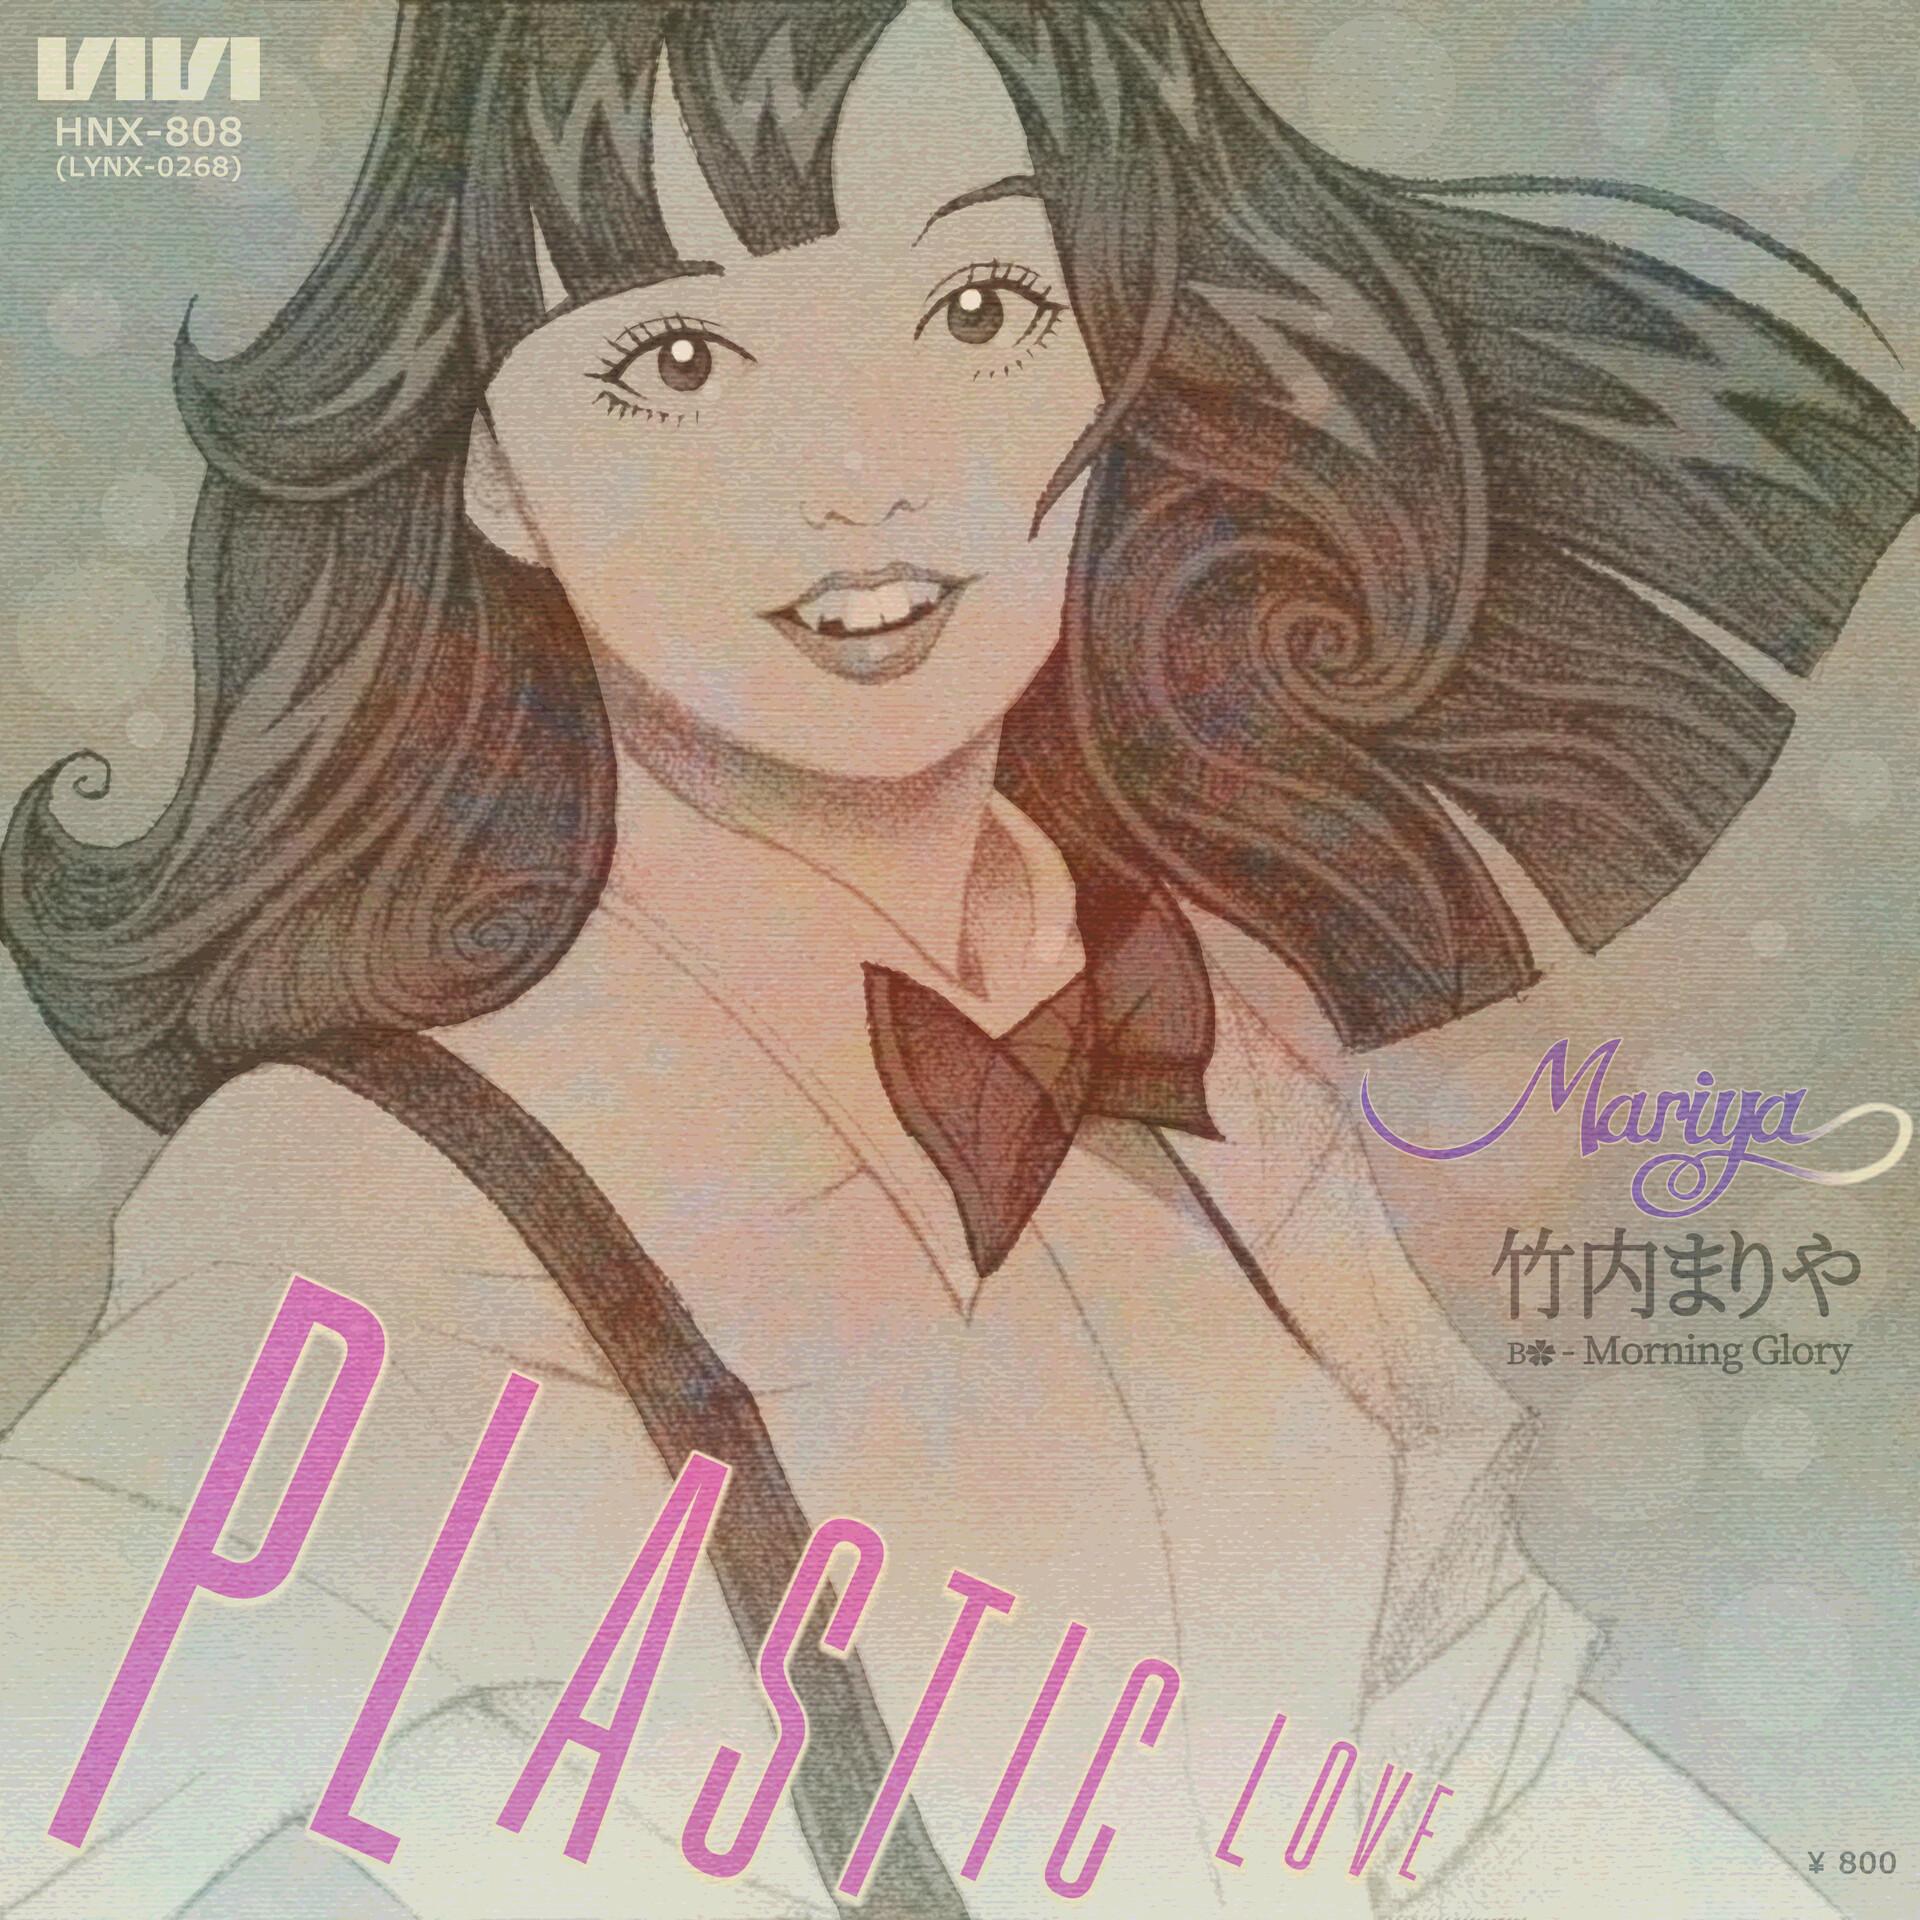 Plastic Love II - Plastic Love